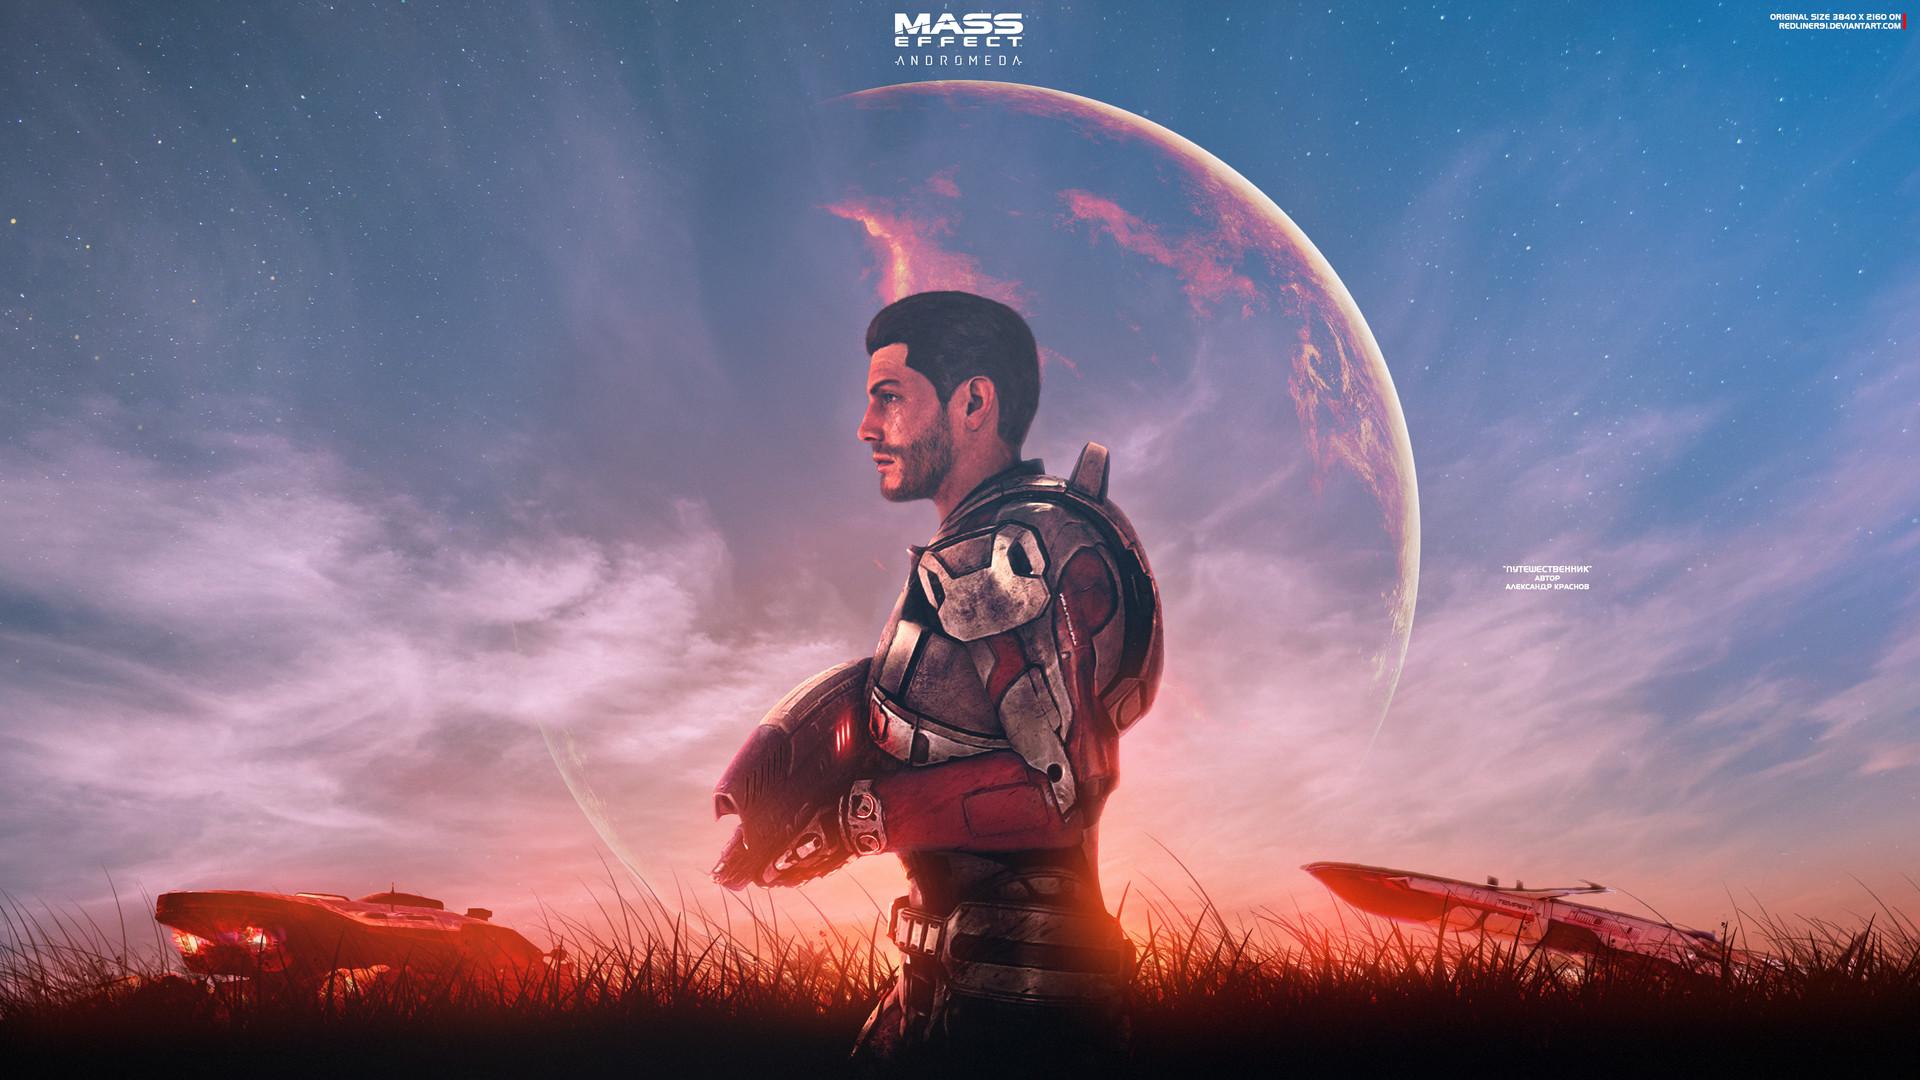 Alexander Krasnov Traveler Mass Effect Andromeda 4k